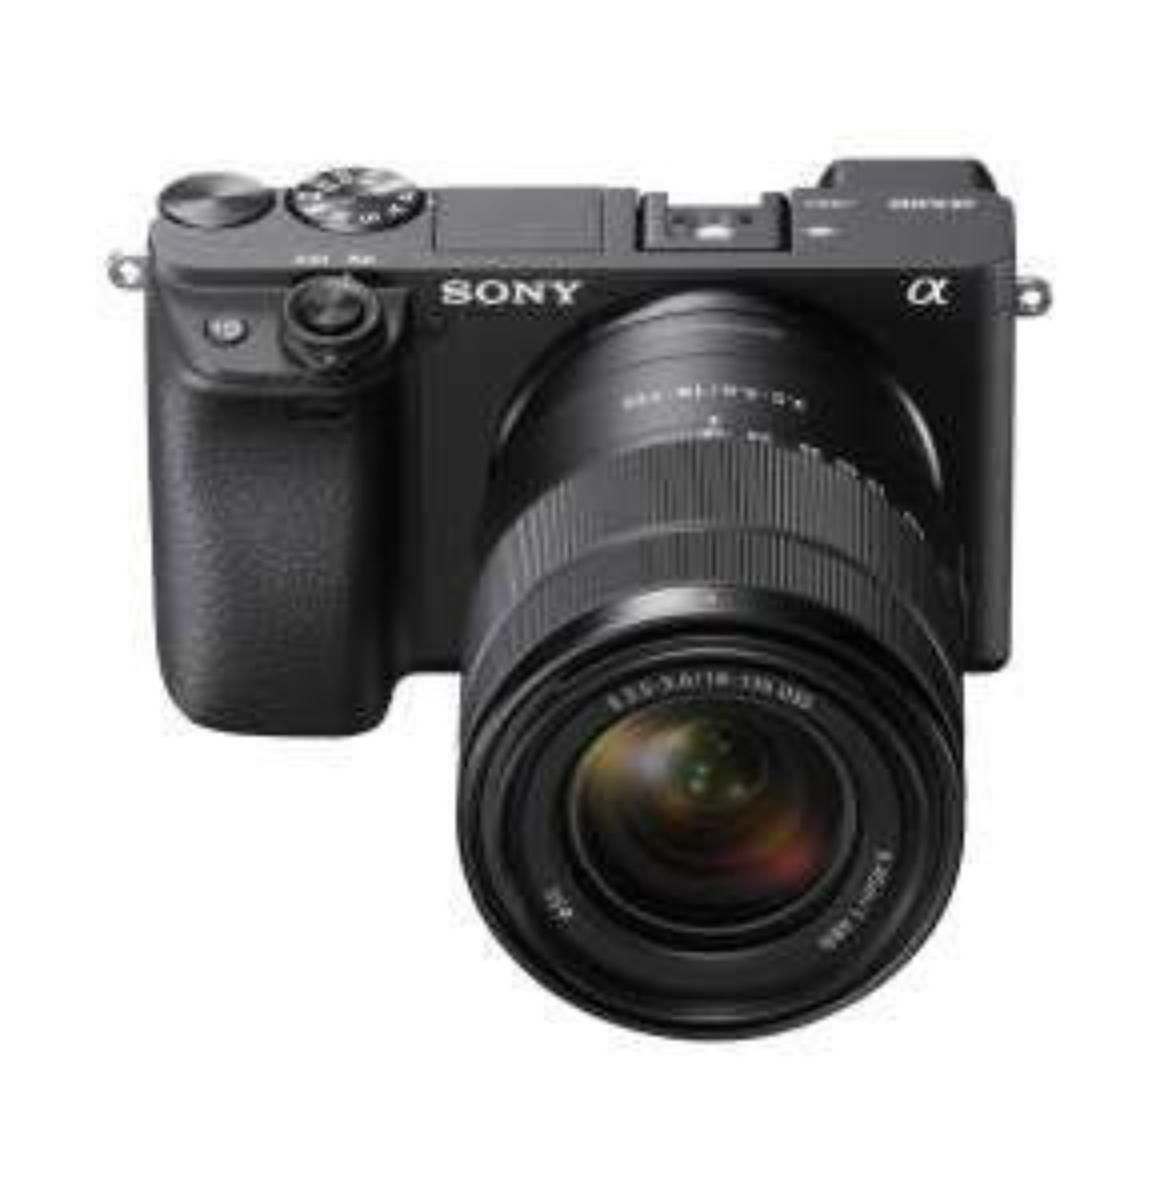 Sony Alpha ILCE-6400 mit Kit-Objektiv 18-135mm wieder bestellbar bei Amazon.fr